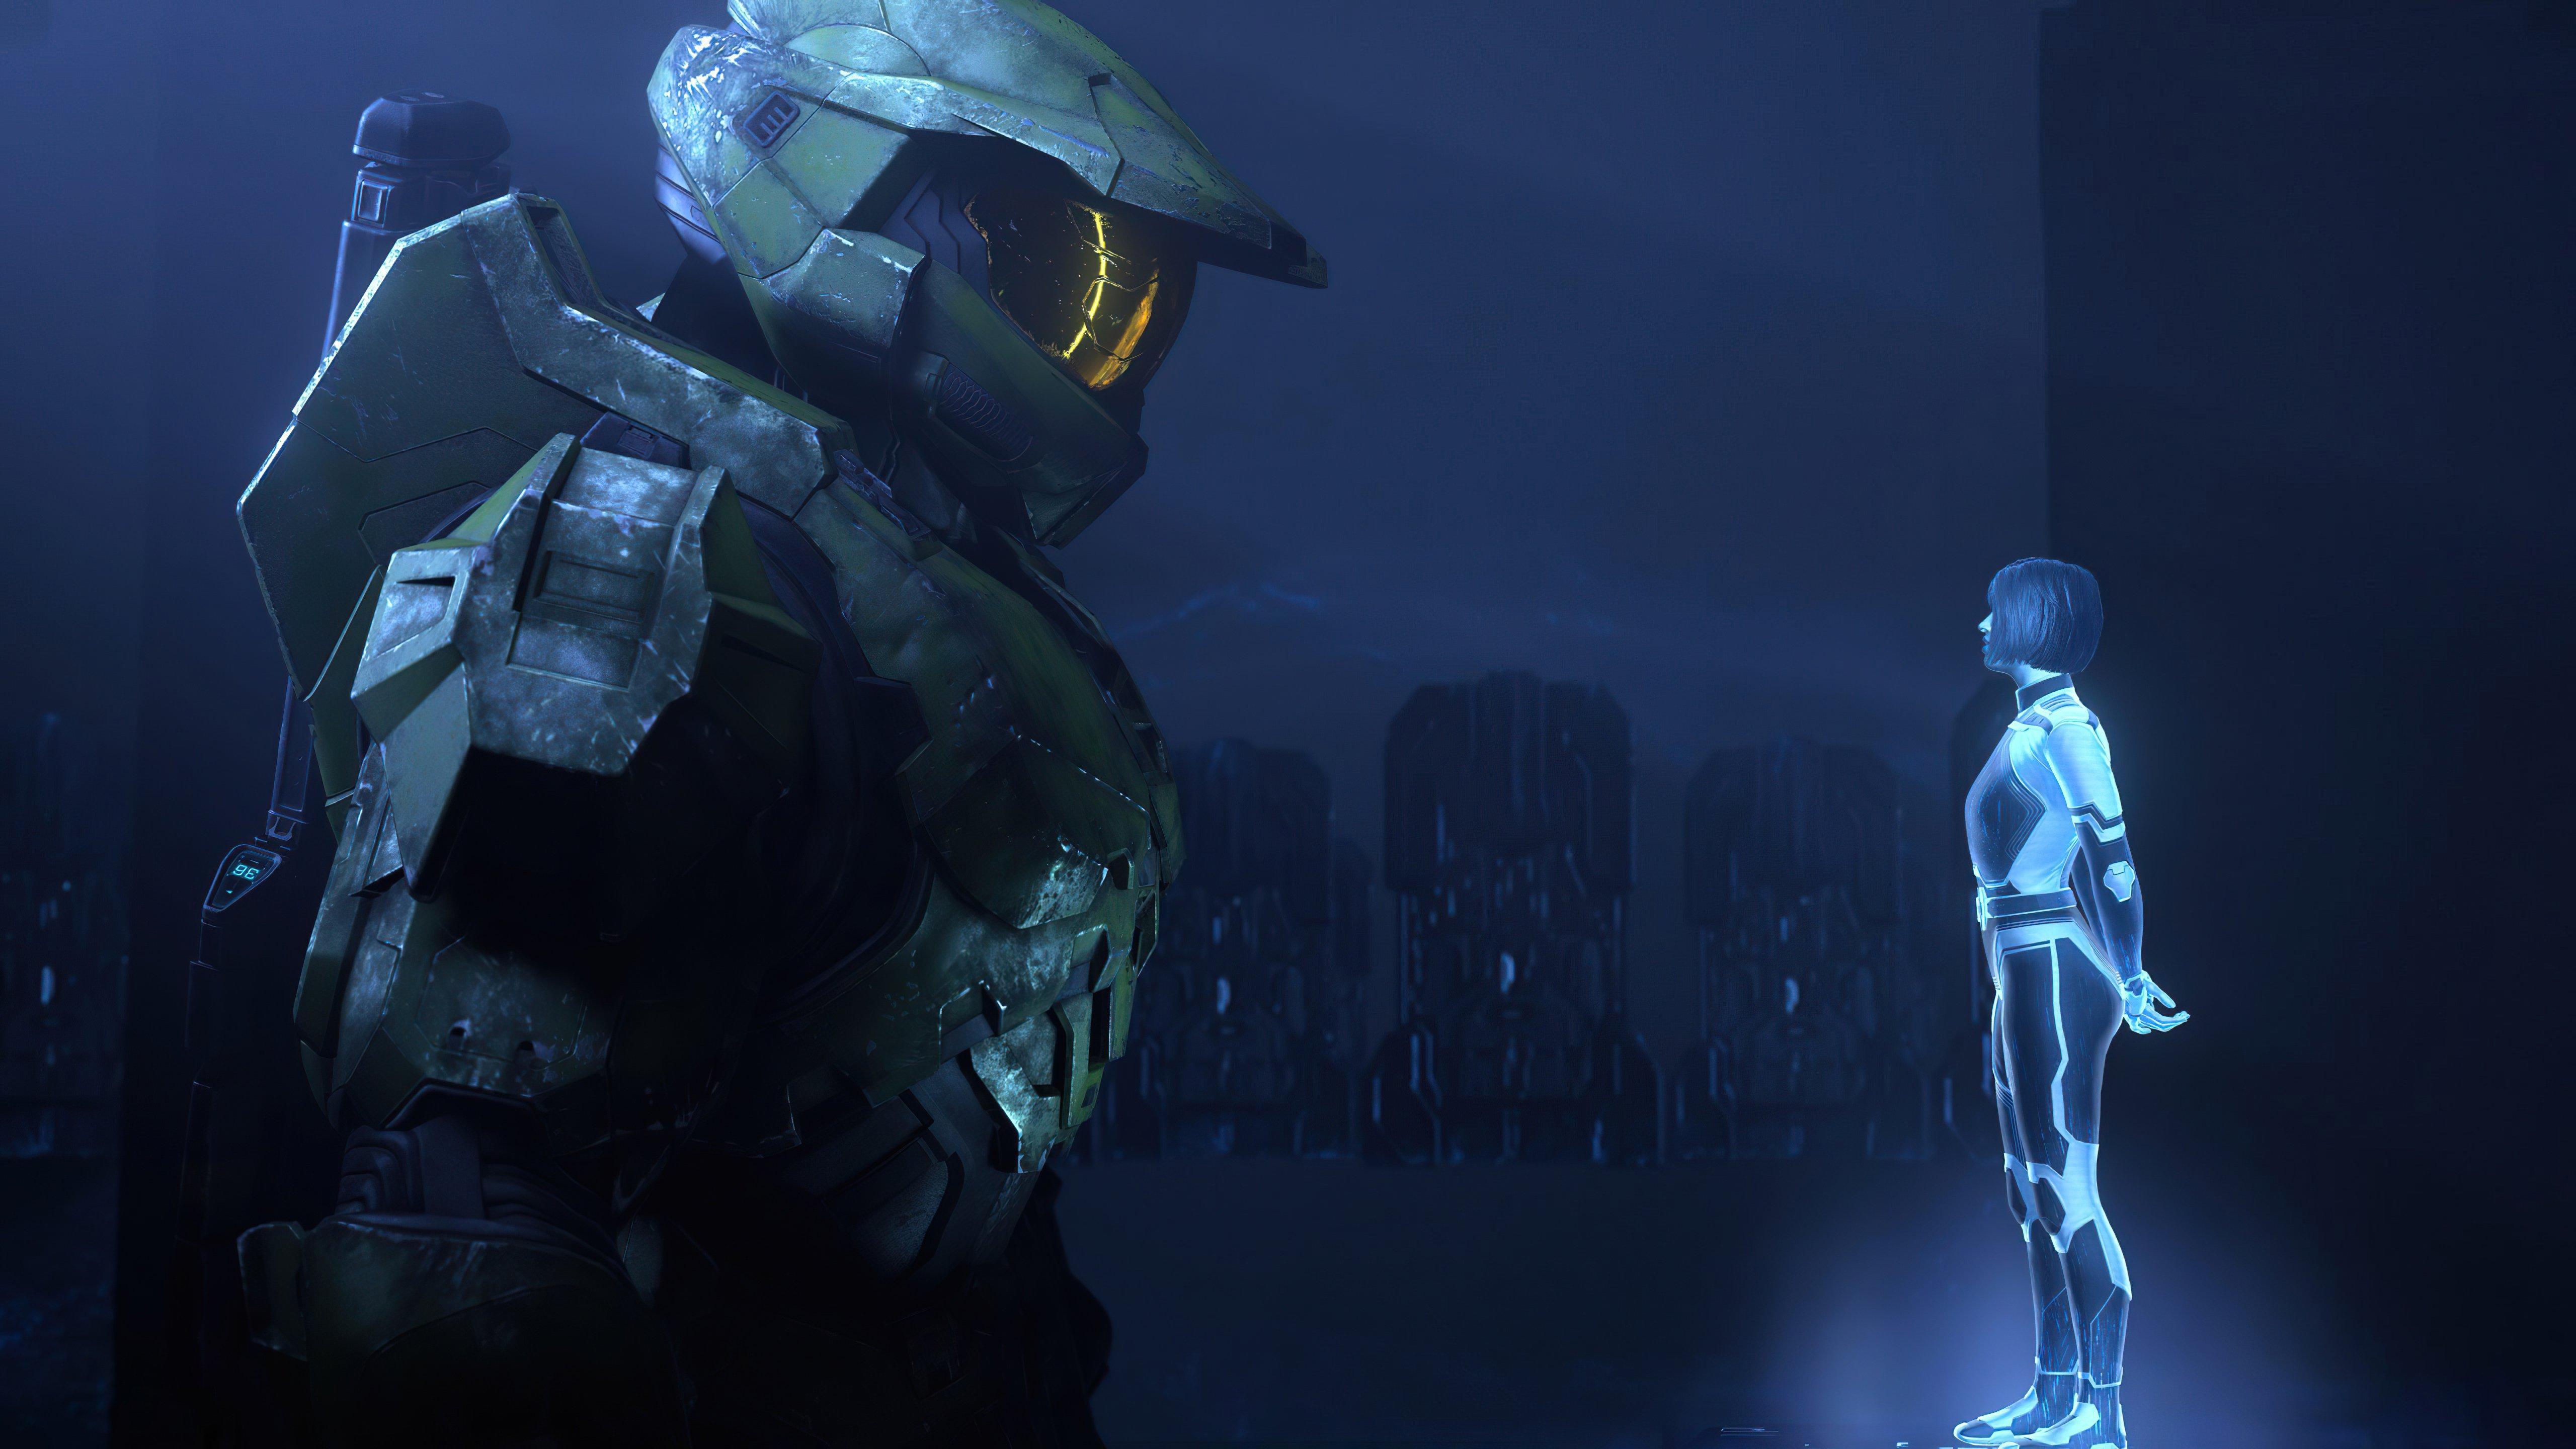 Fondos de pantalla Halo Infinite Multiplayer